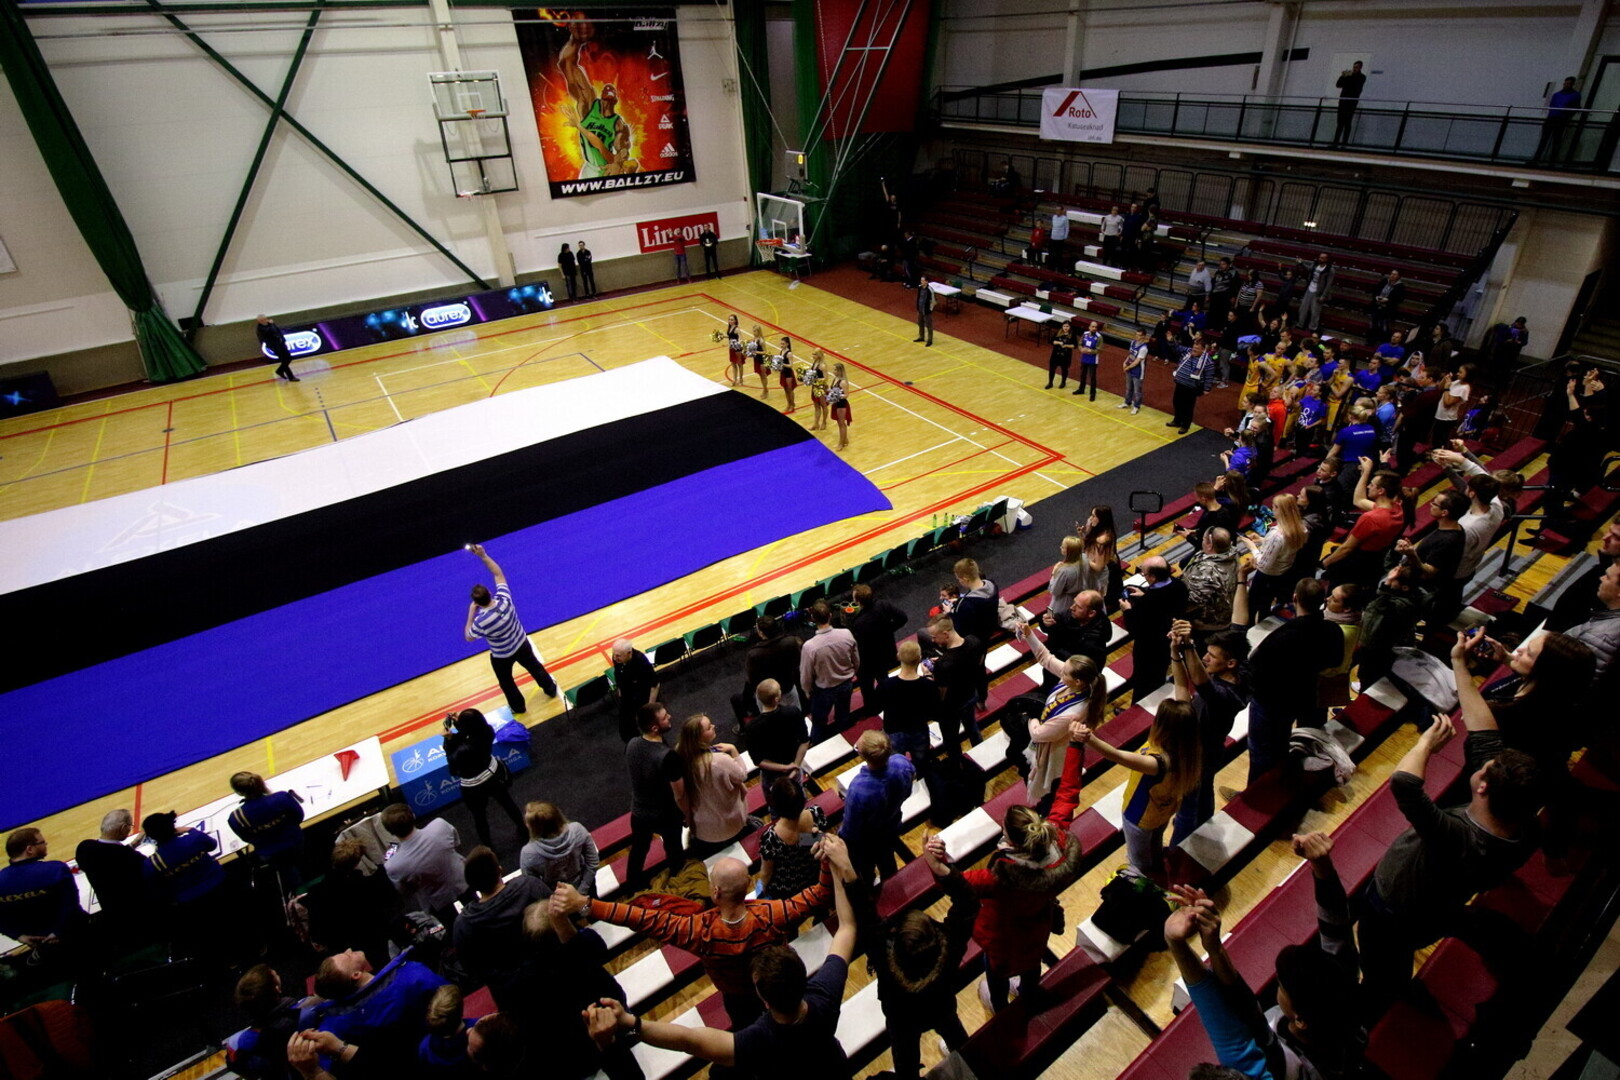 e4a4c1c044d FOTOD | Audentese spordihoones laotati põrandale hiiglaslik Eesti ...